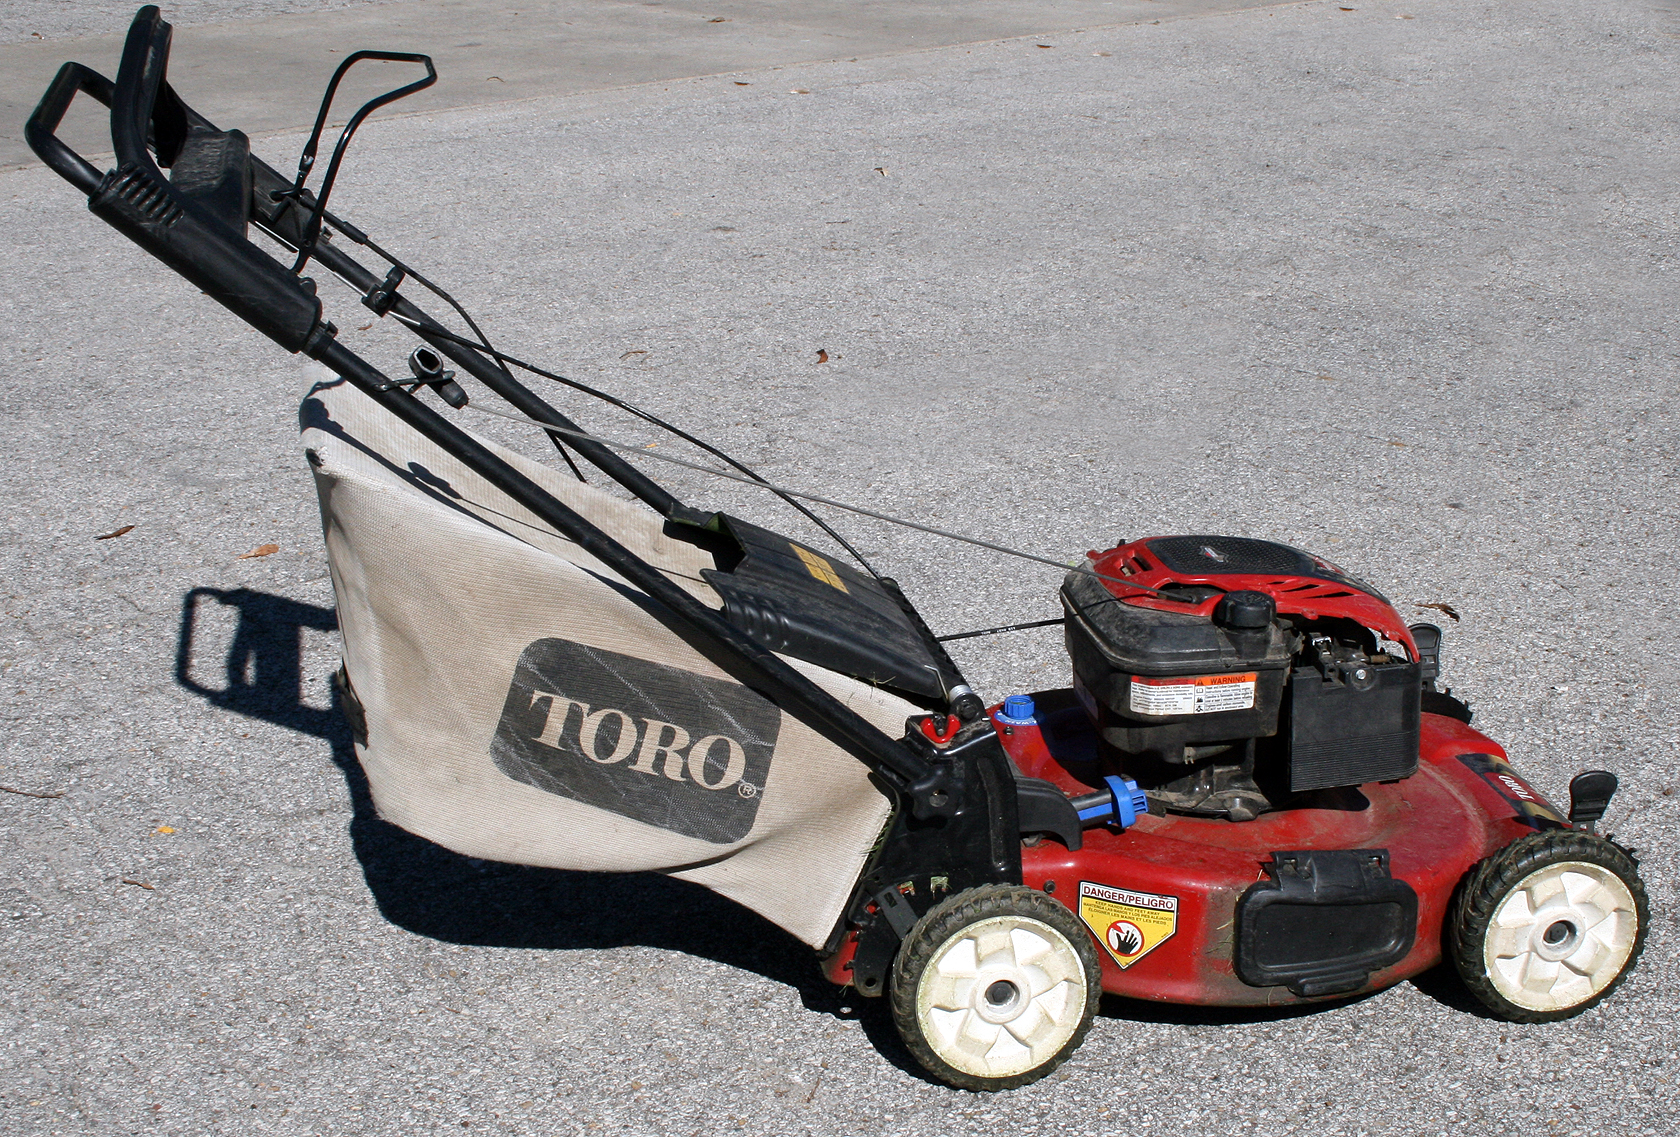 22 Toro Recycler Lawn Mower Rental